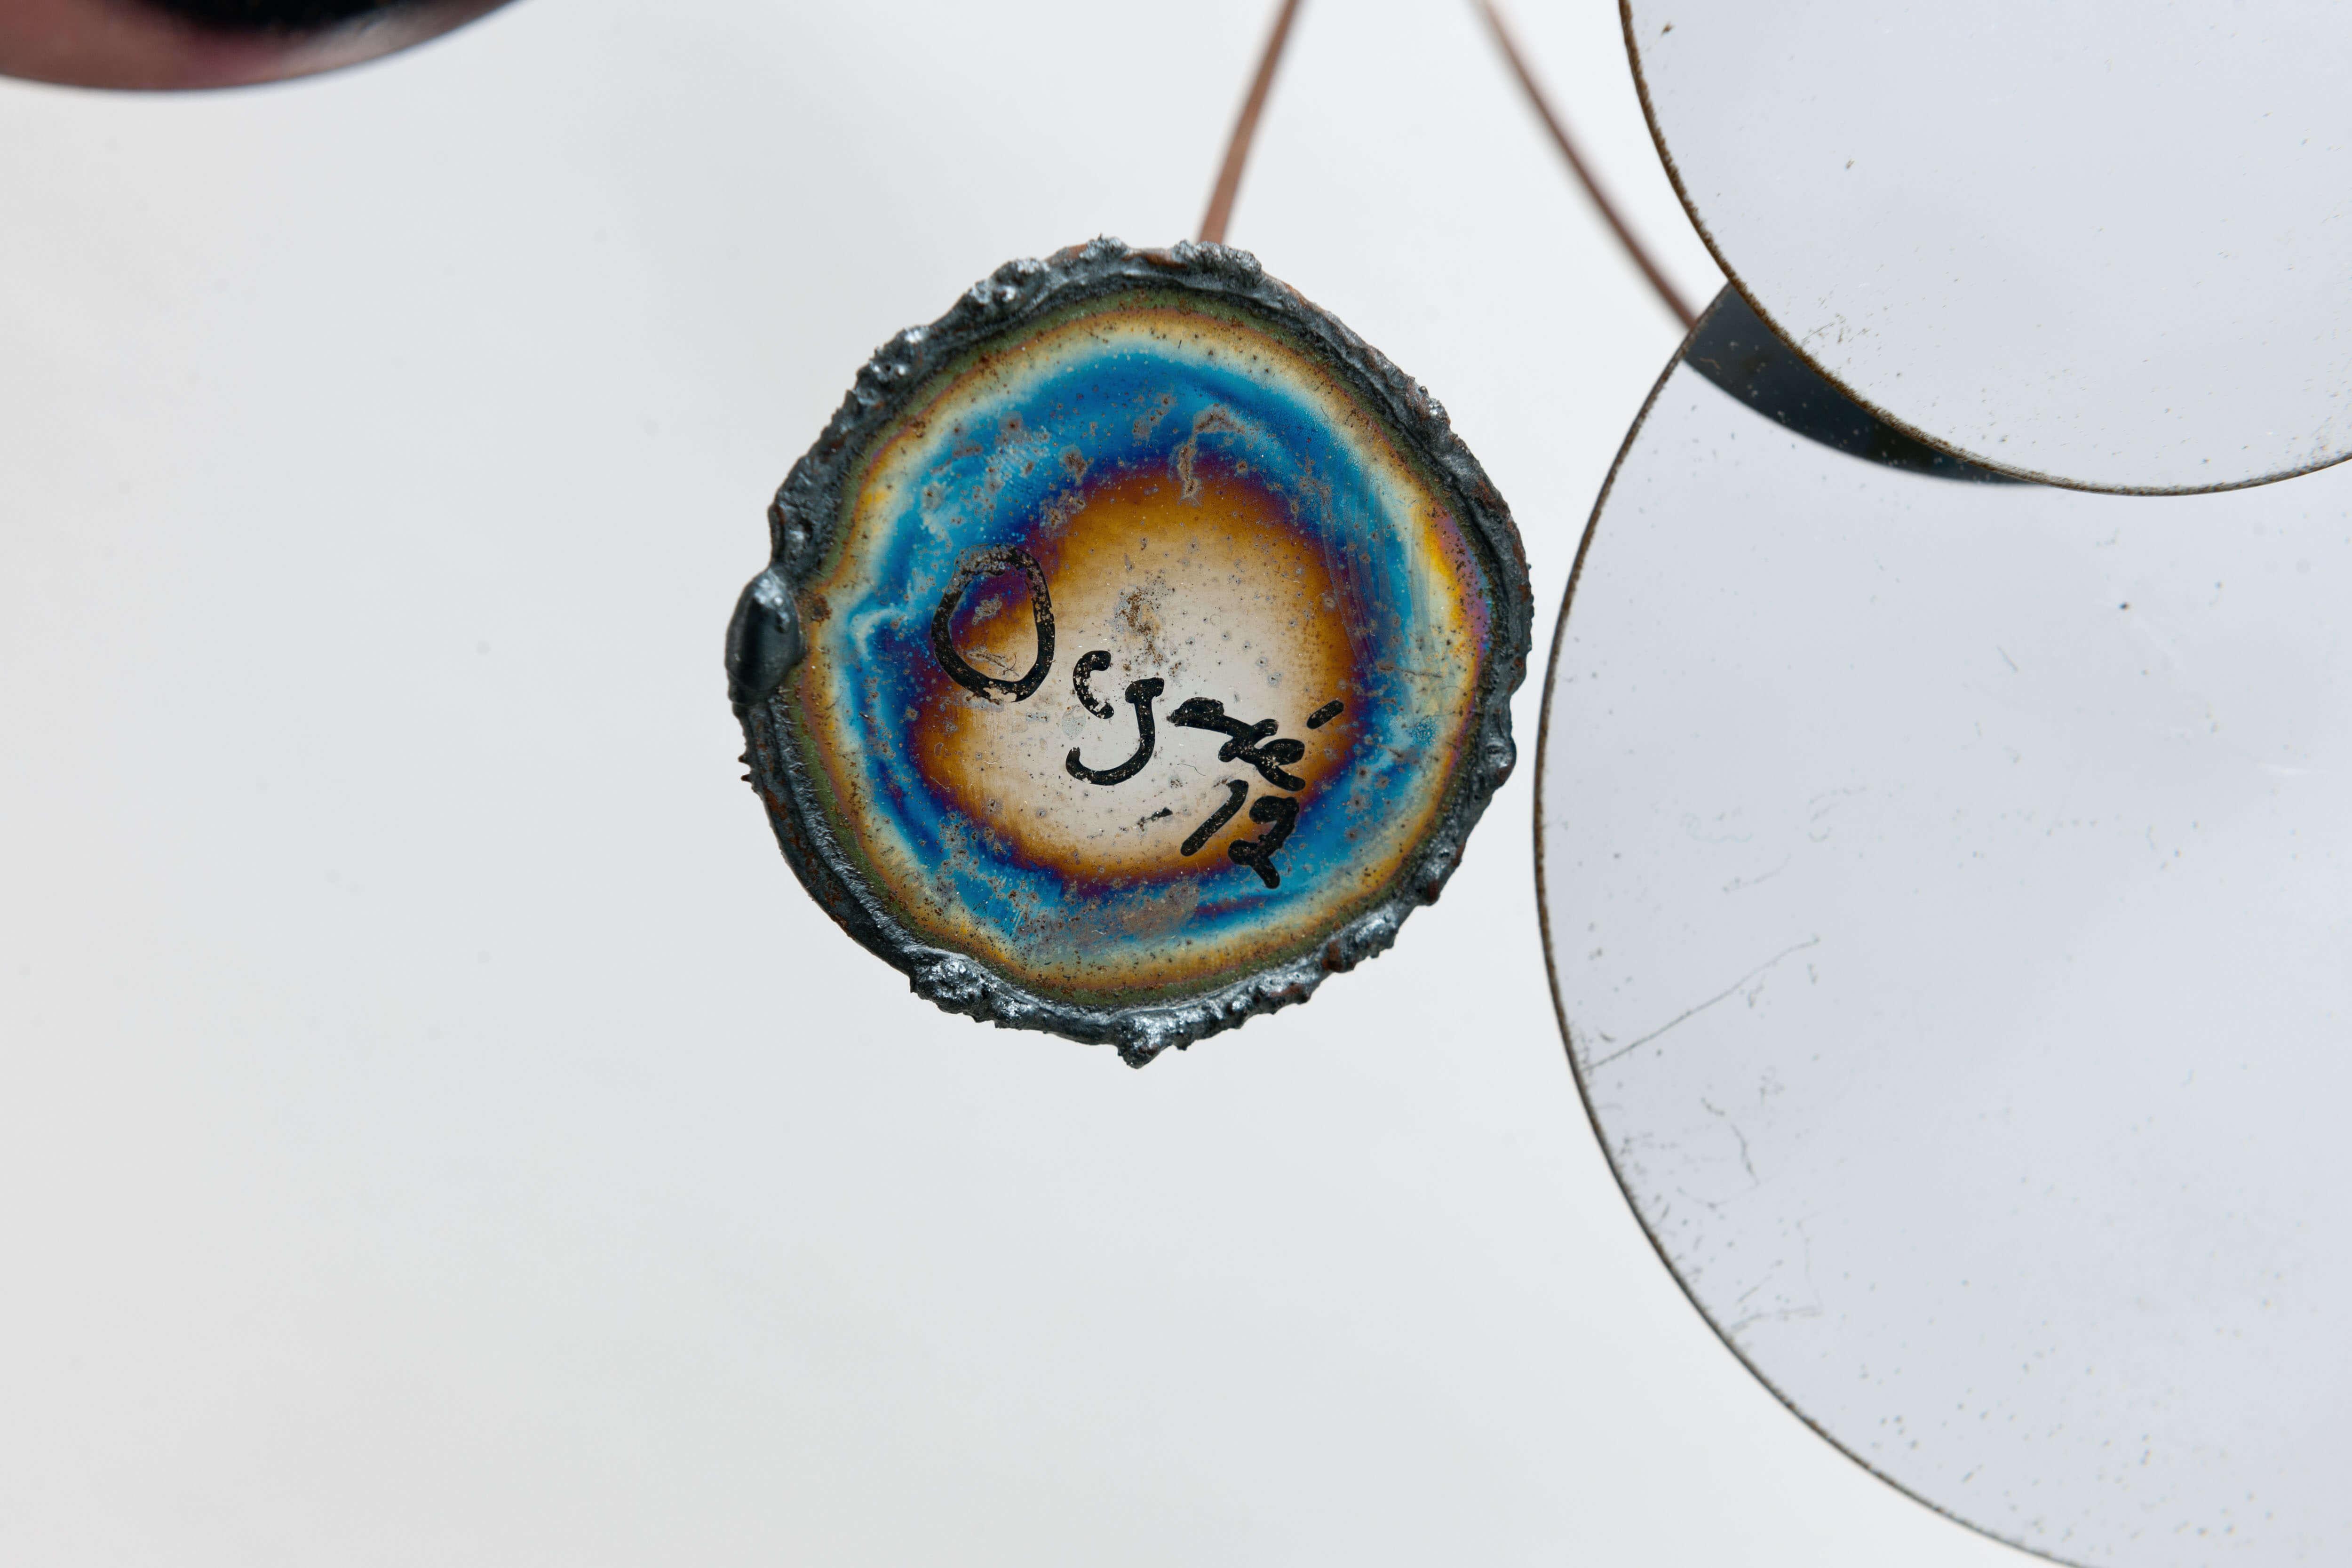 Vintage Raindrops wandobject – Chroom – gesigneerd